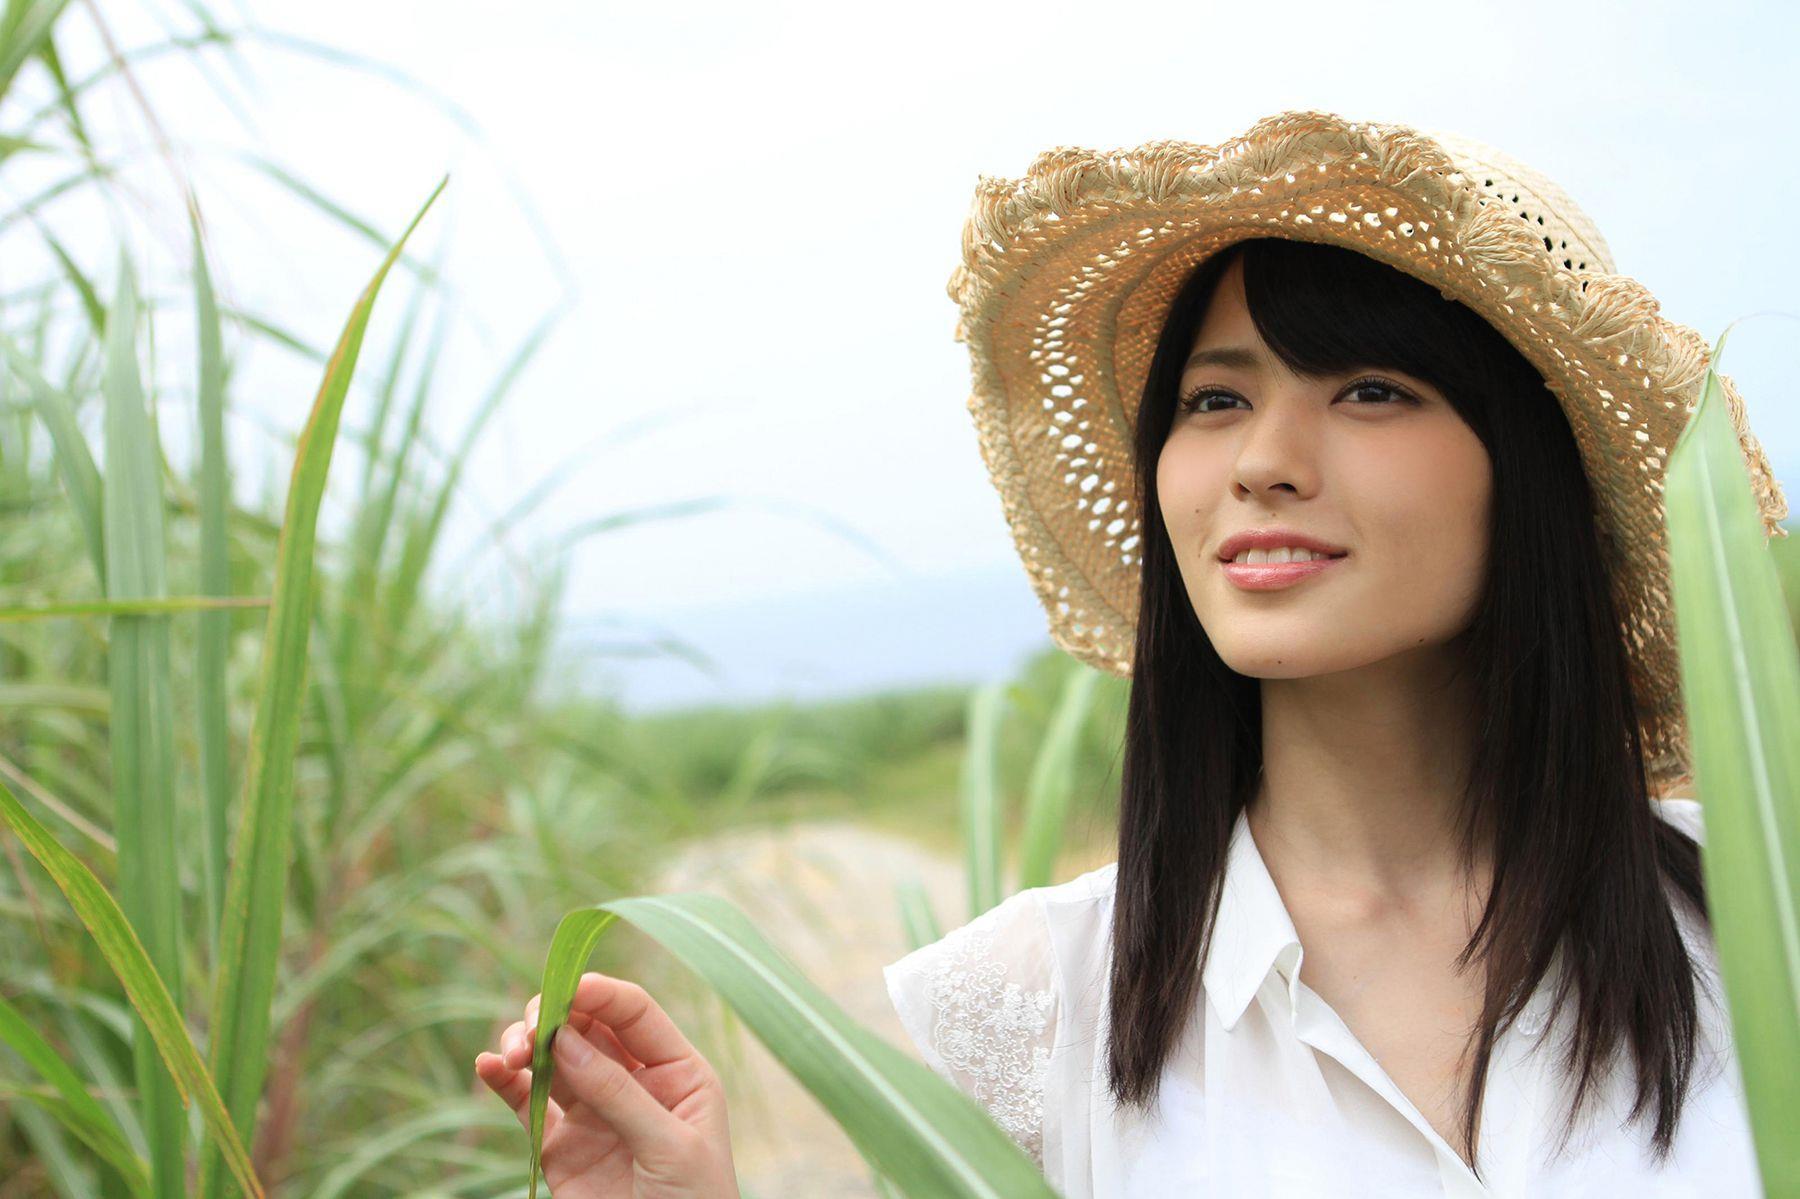 矢島舞美 エロ画像 34